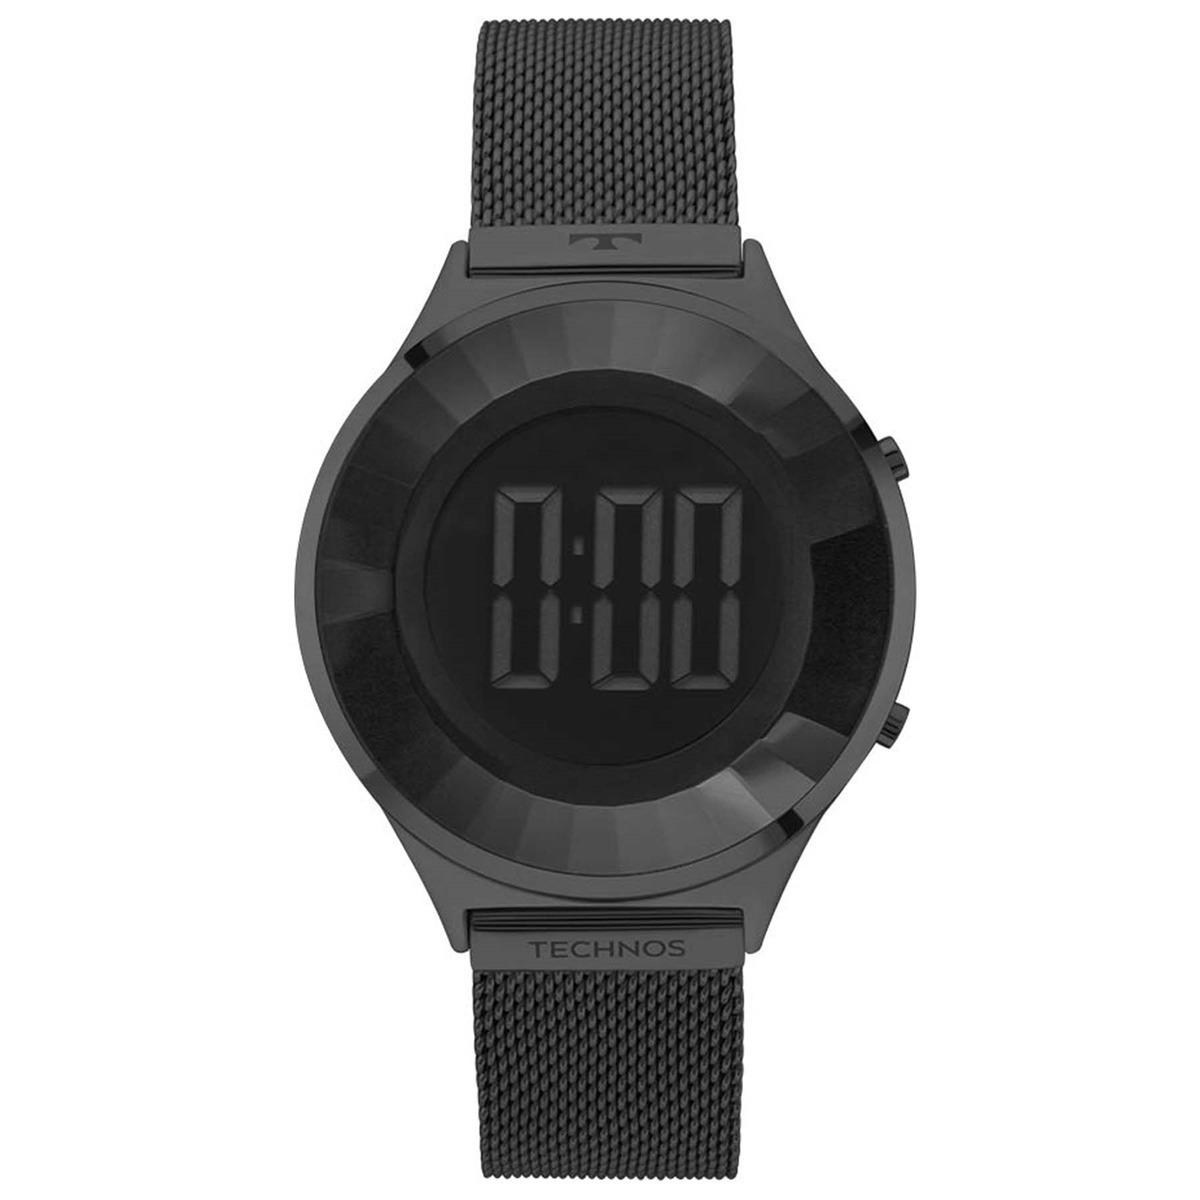 9b0aa2c449245 Relógio Technos Digital Feminino Bj3572ab 4p - R  649,00 em Mercado ...